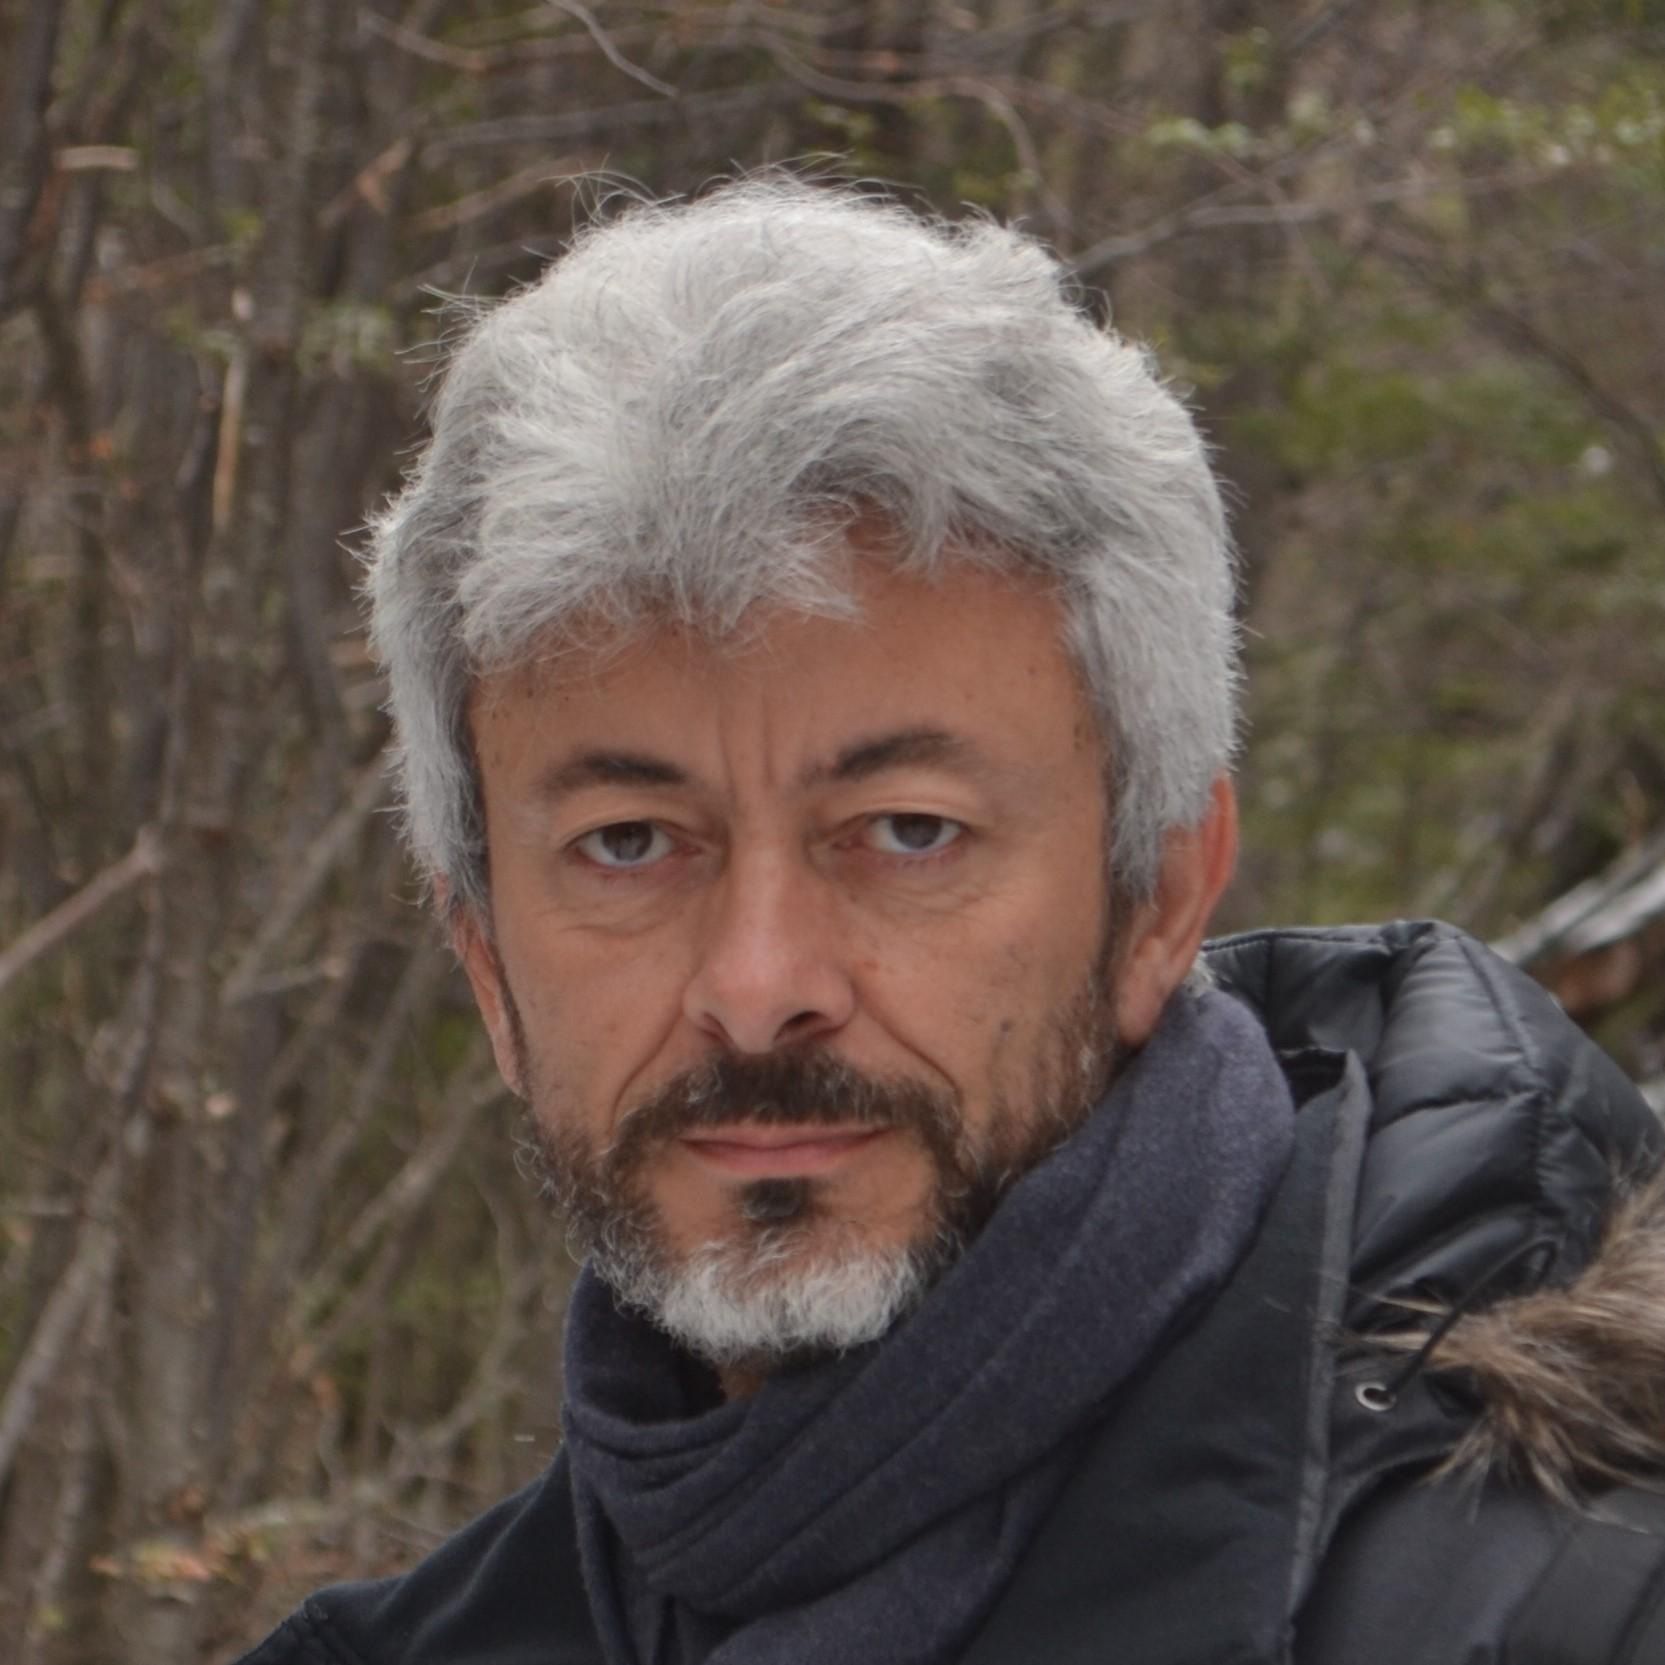 Carlos Gamerro